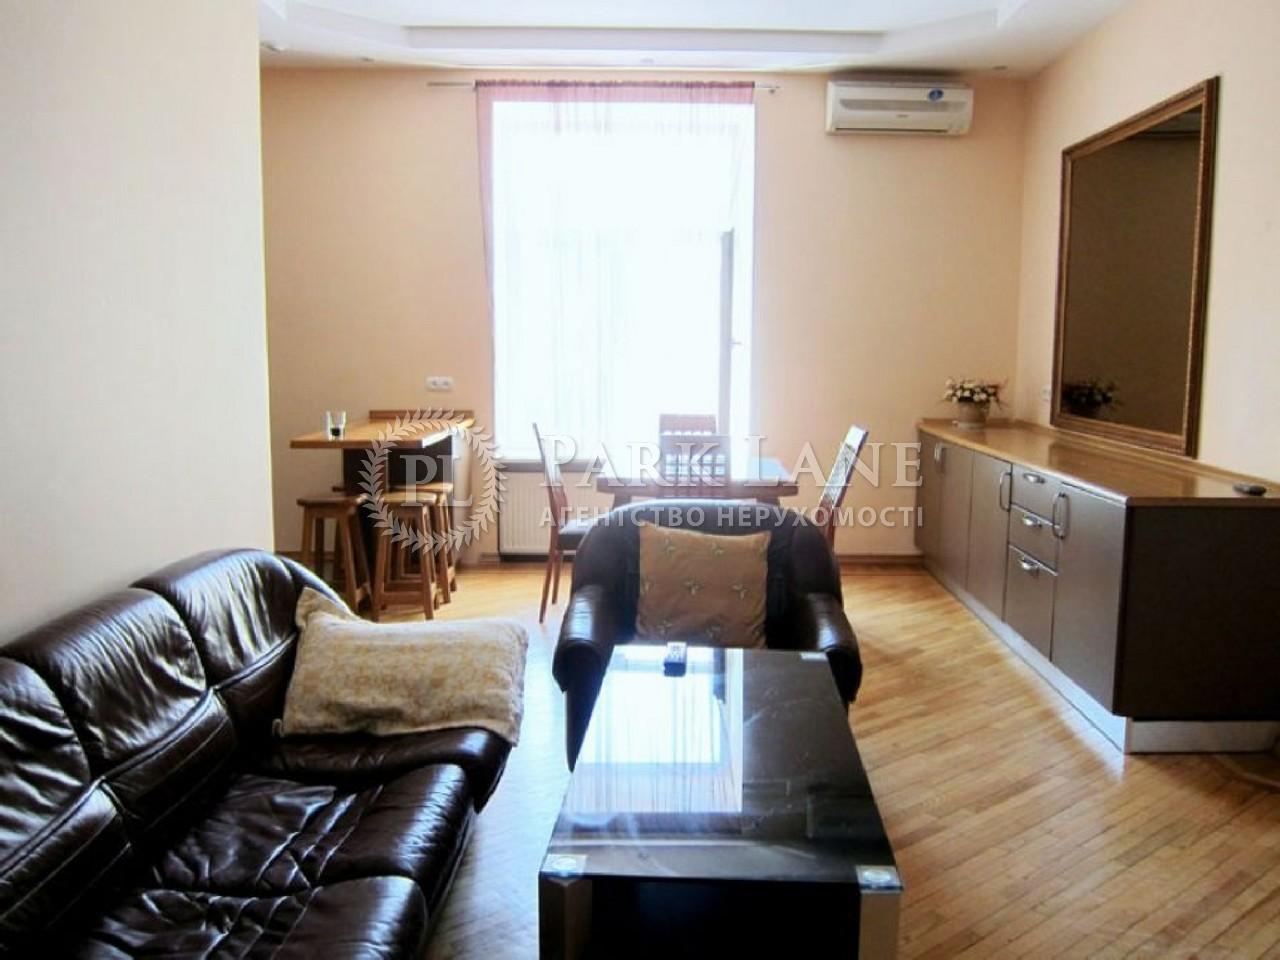 Квартира вул. Шота Руставелі, 20б, Київ, C-94434 - Фото 10